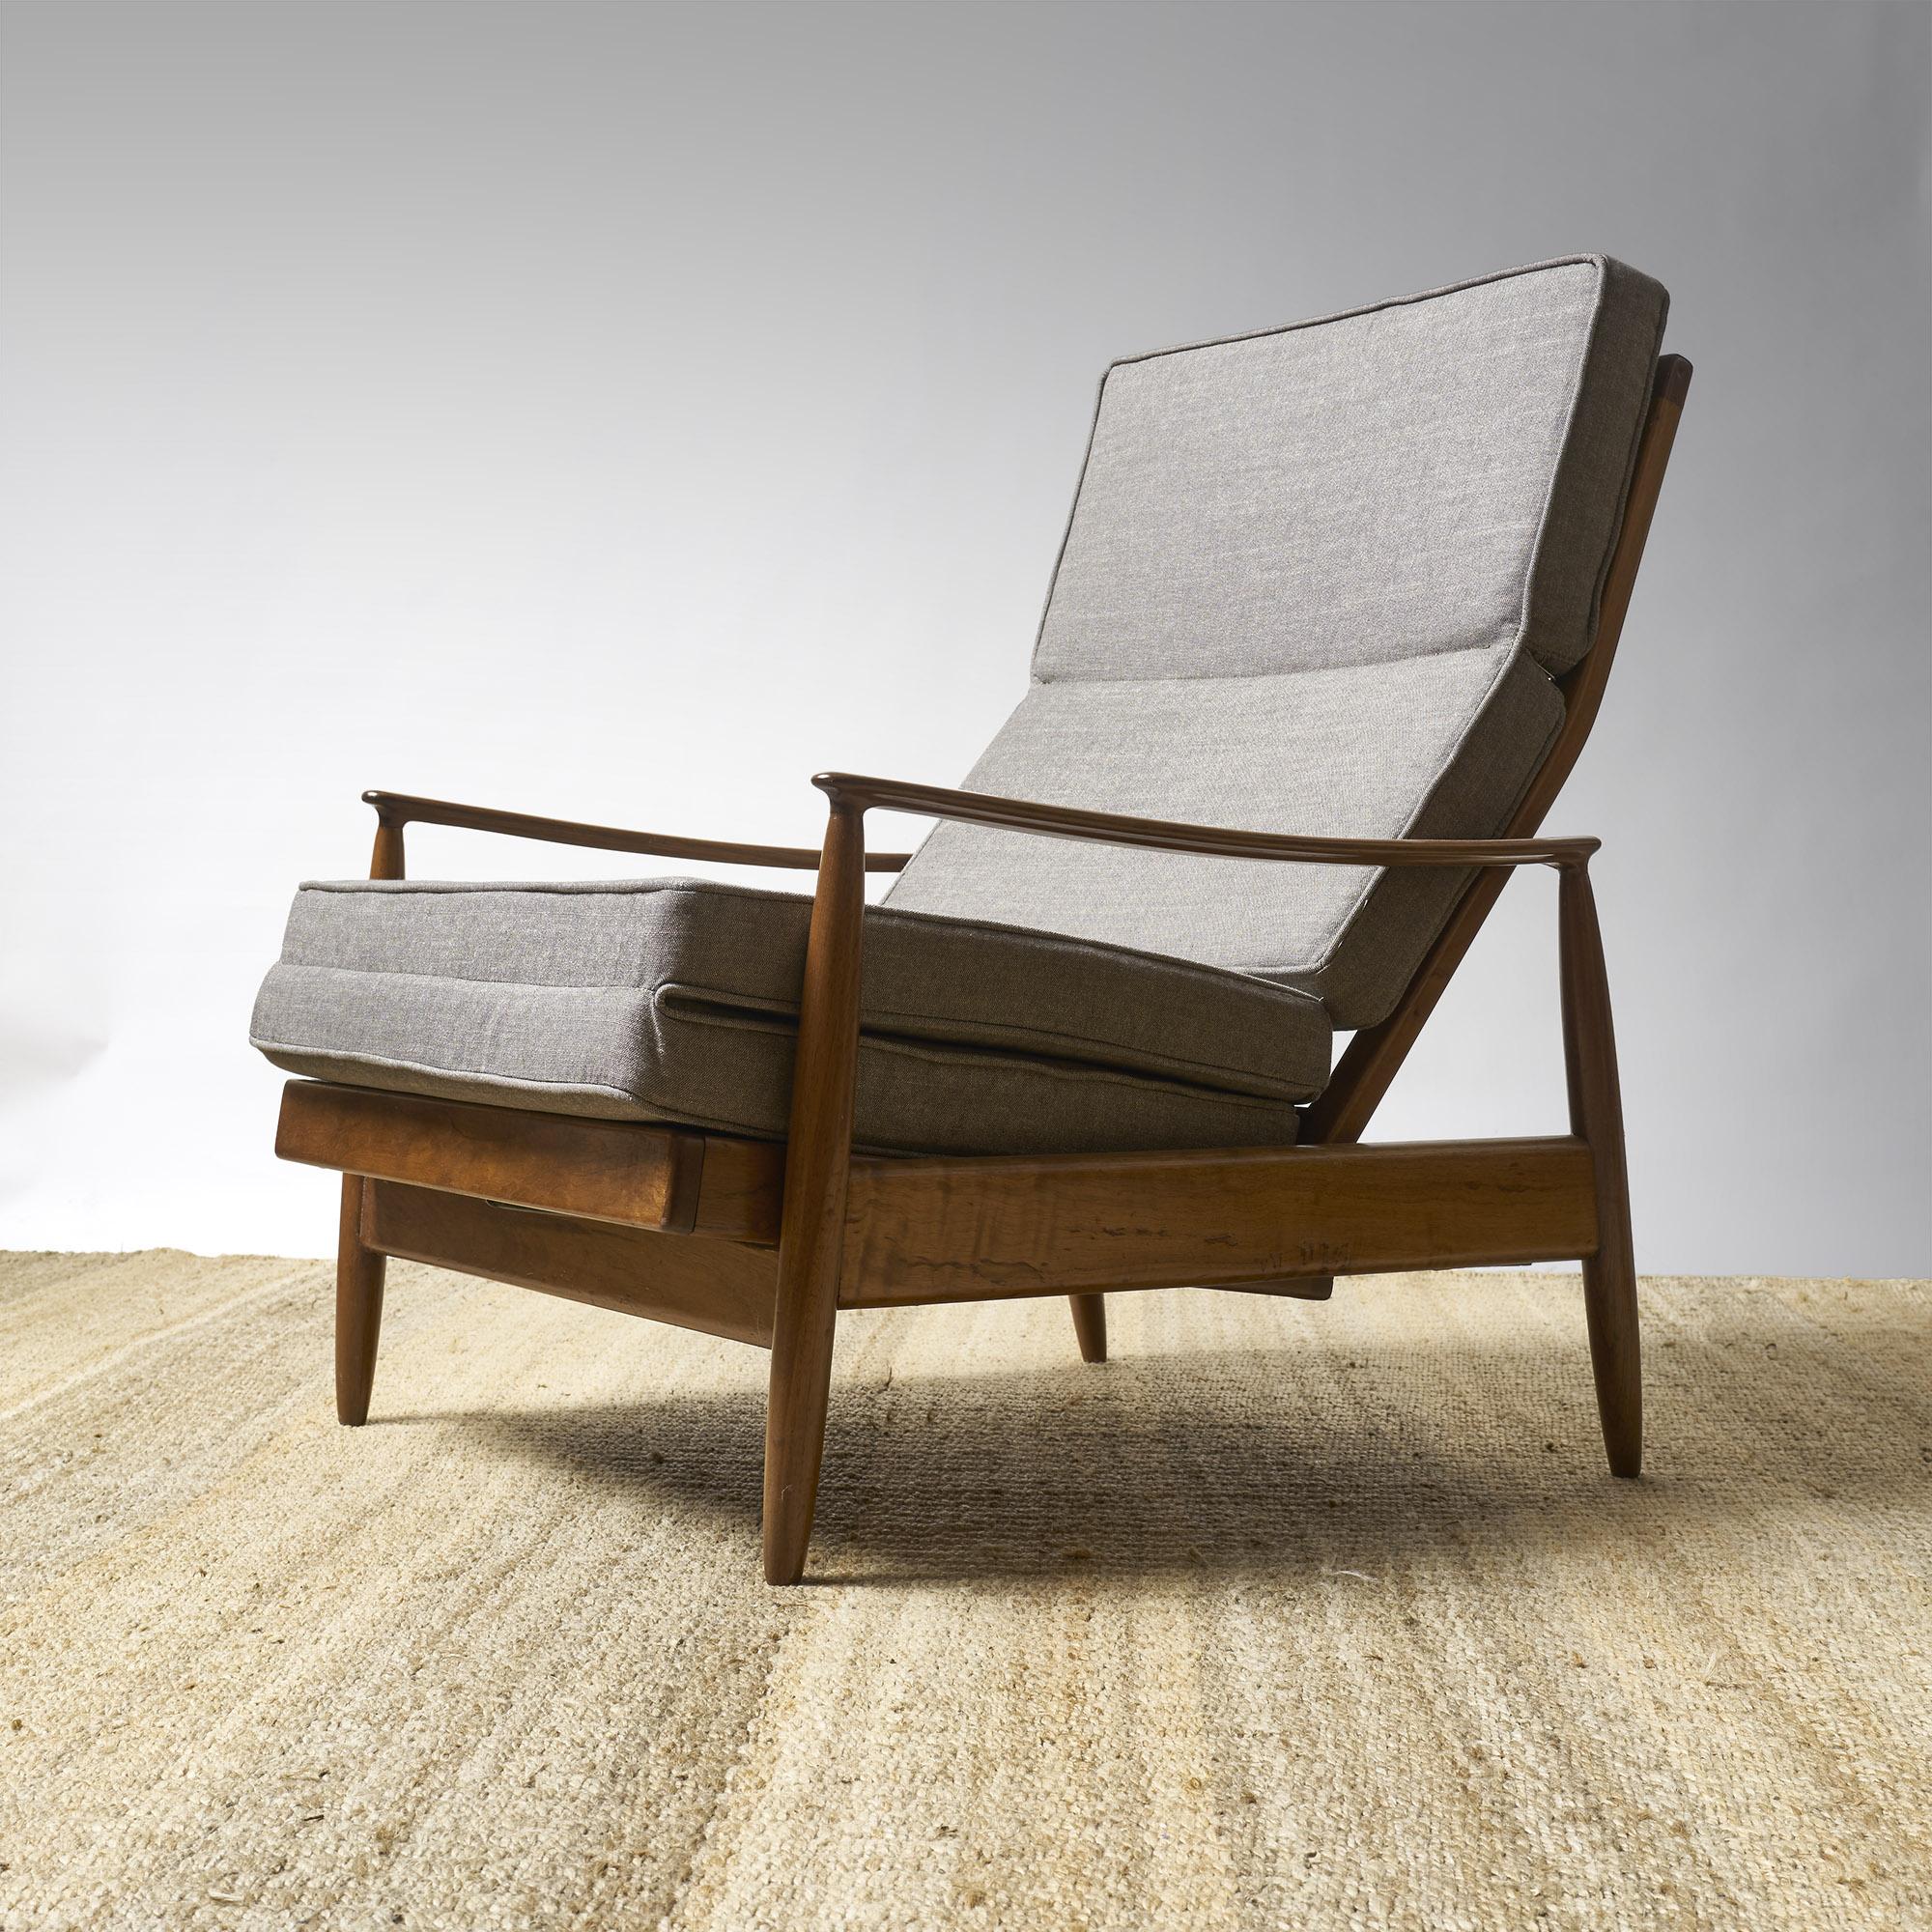 Par de sillones reposeras reclinables totalmente